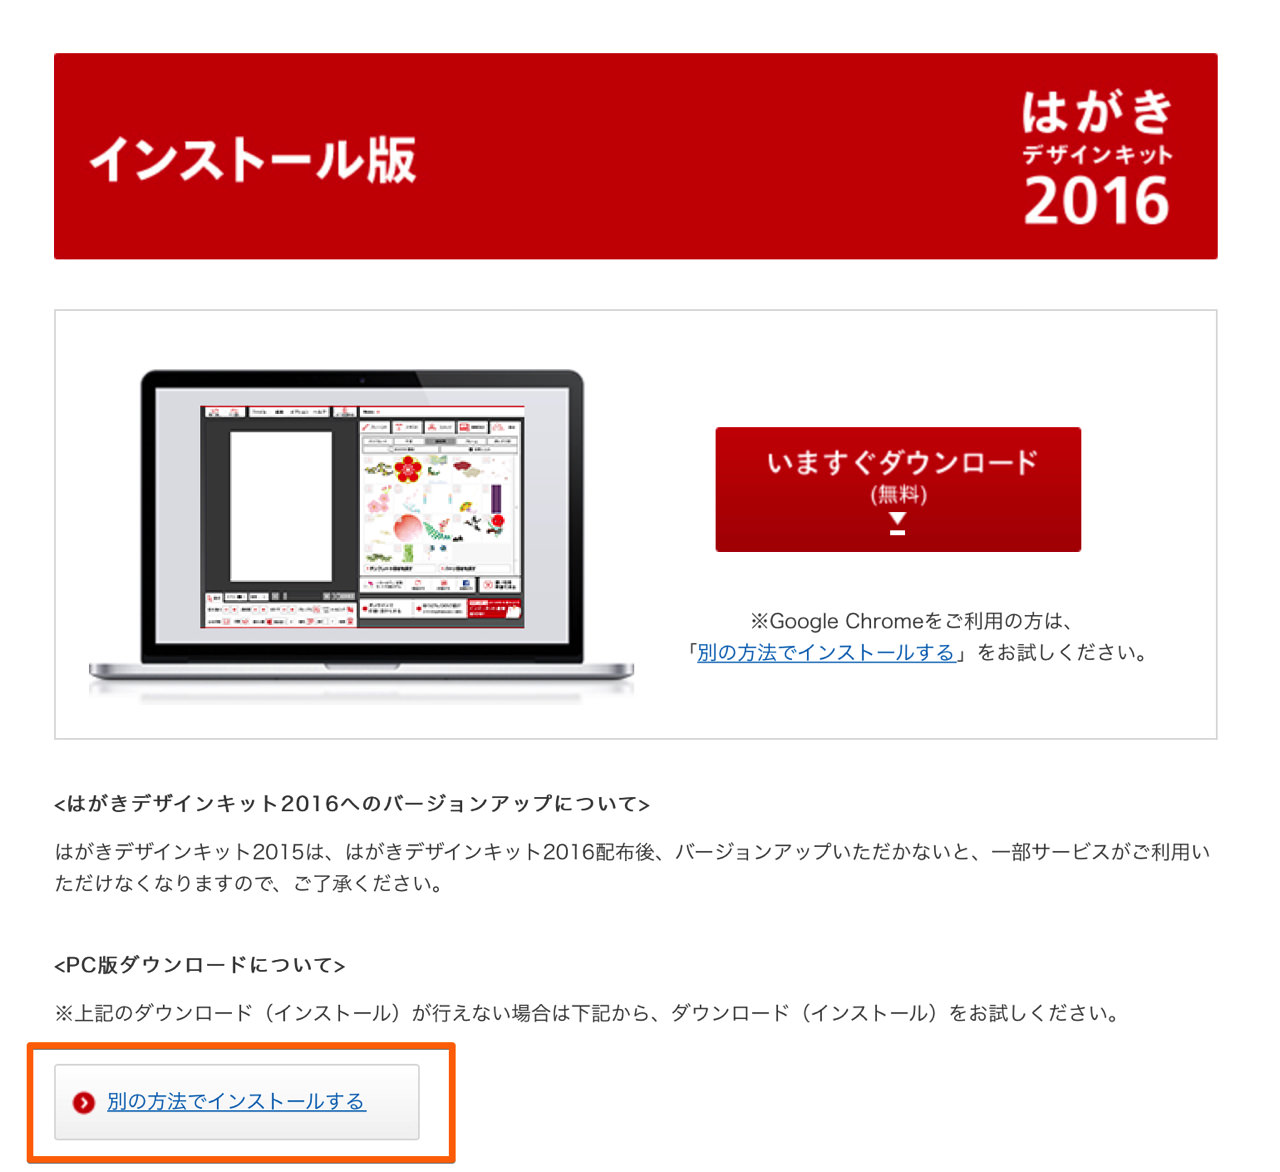 Hagaki design kit 20164